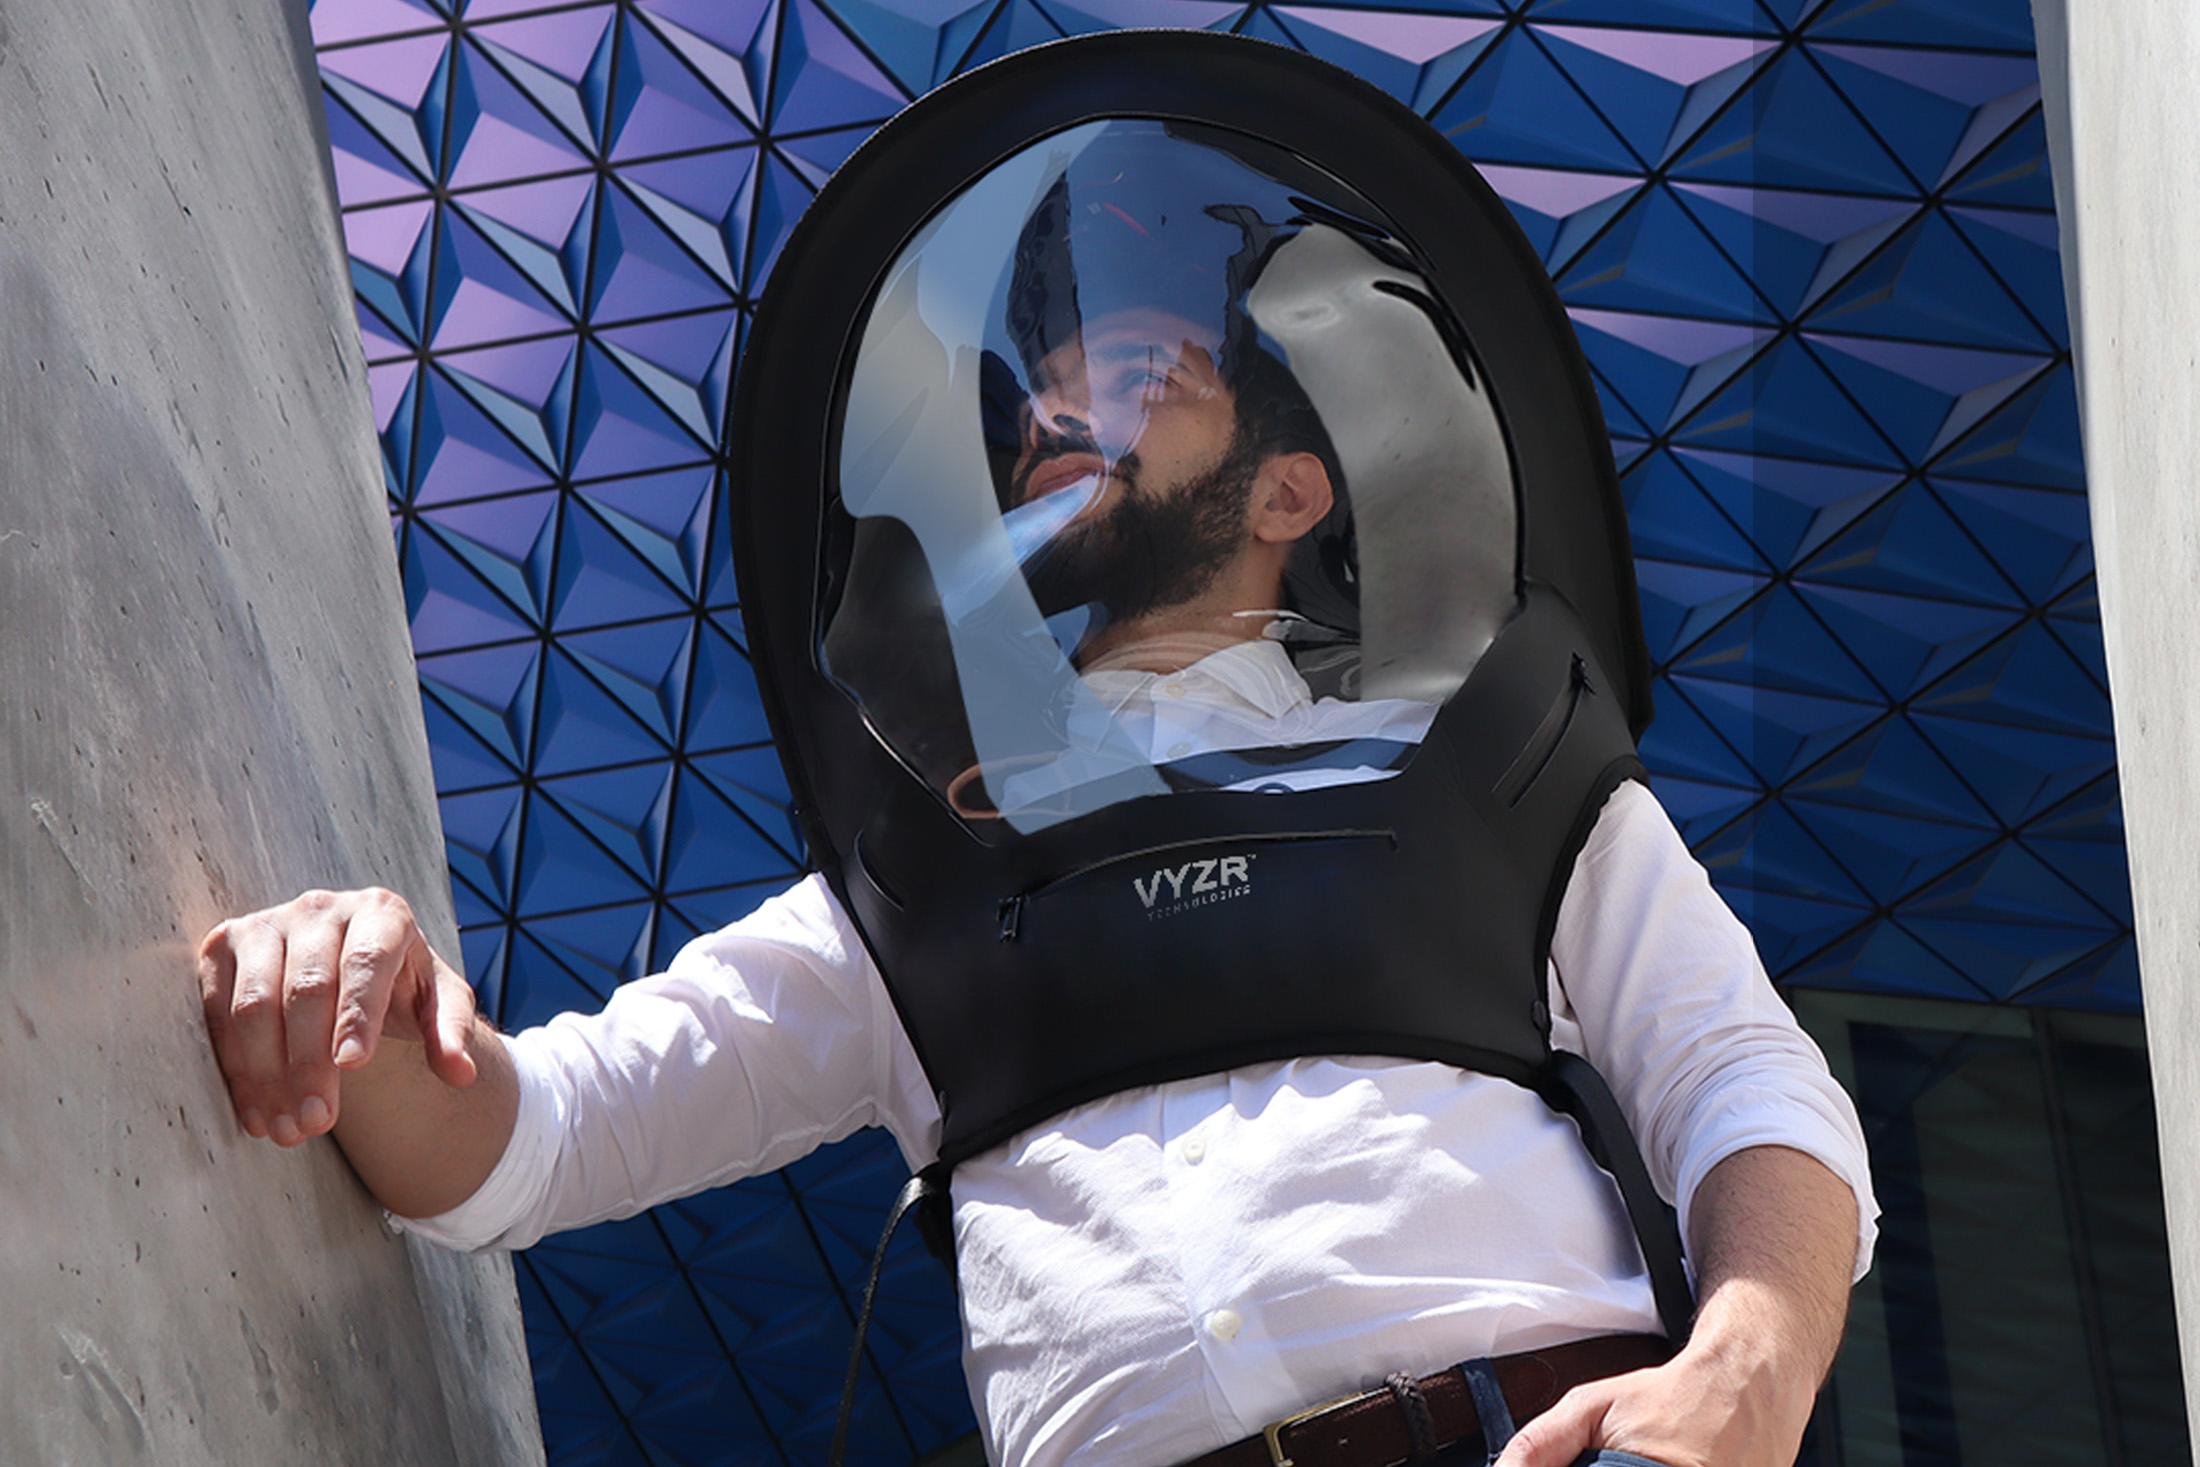 Biovyzr Hazmat Suits Aim To Make Flying Safer During Coronavirus Bloomberg